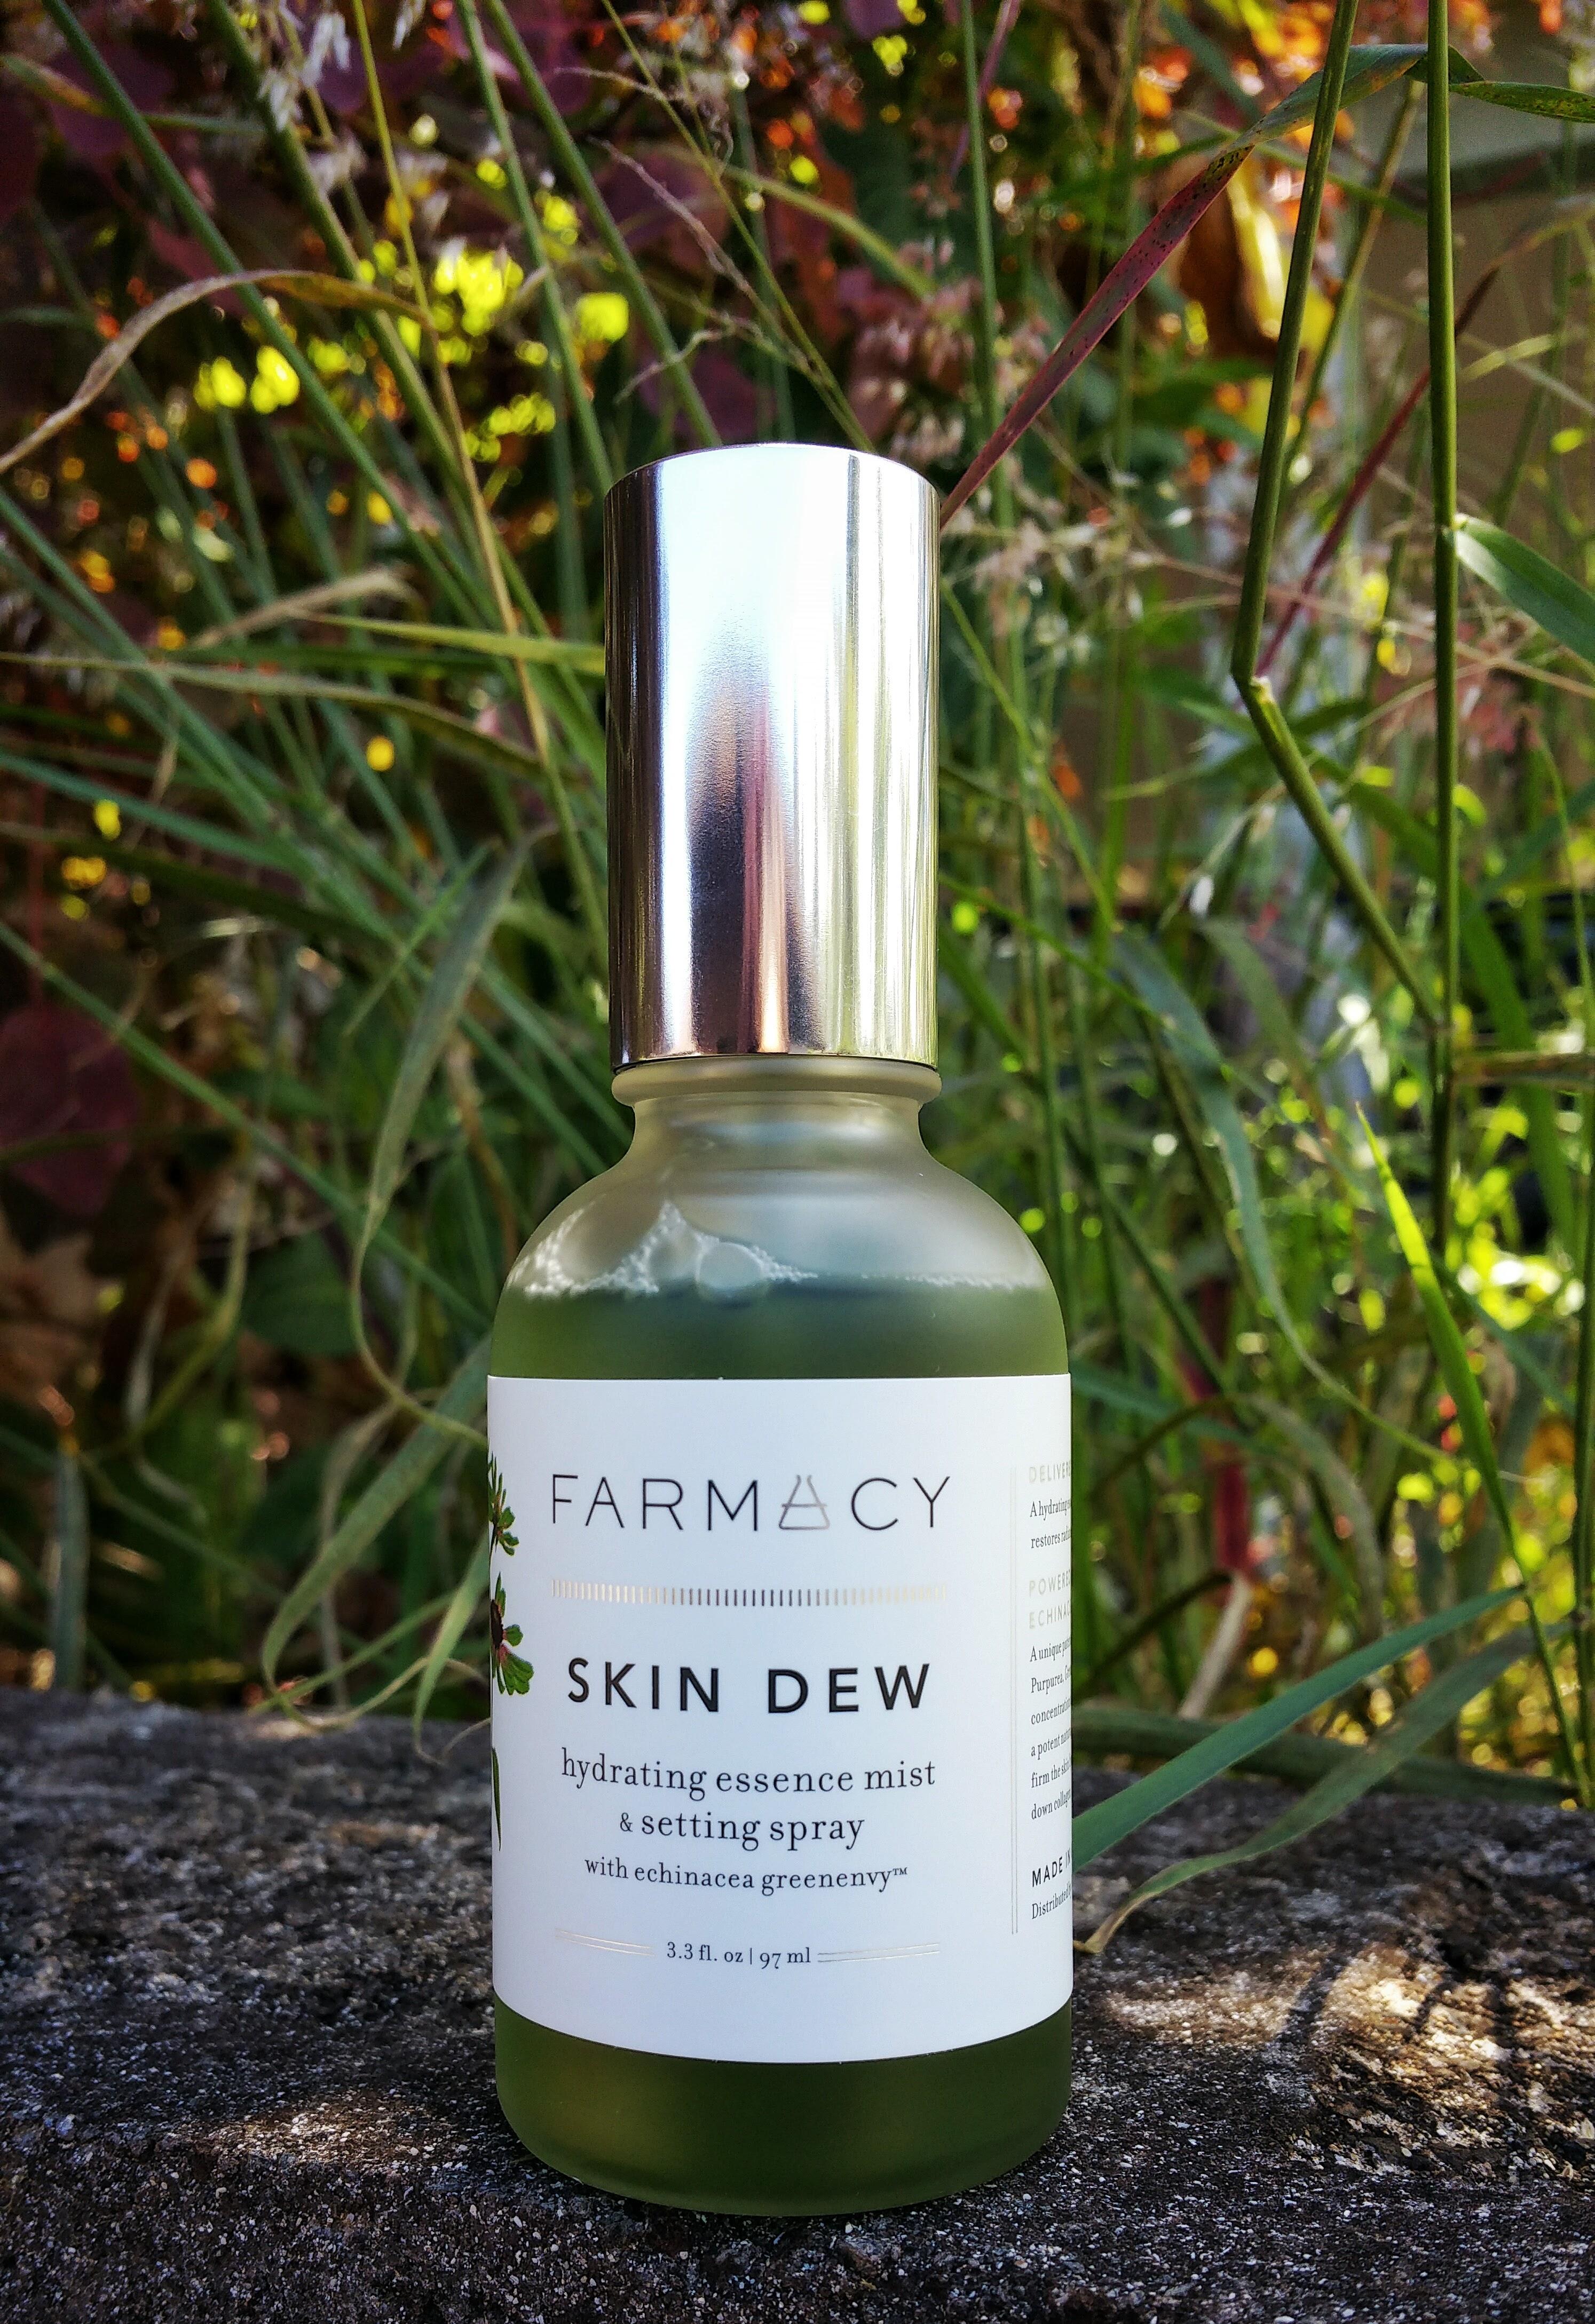 Farmacy, Skin care, moisture, Farmacy Skin Dew, Farmacy Beauty, facial spray, beauty, makeup setting spray, Farmacy skin dew hydrating essence mist and setting spray, makeup spray, farmacy,